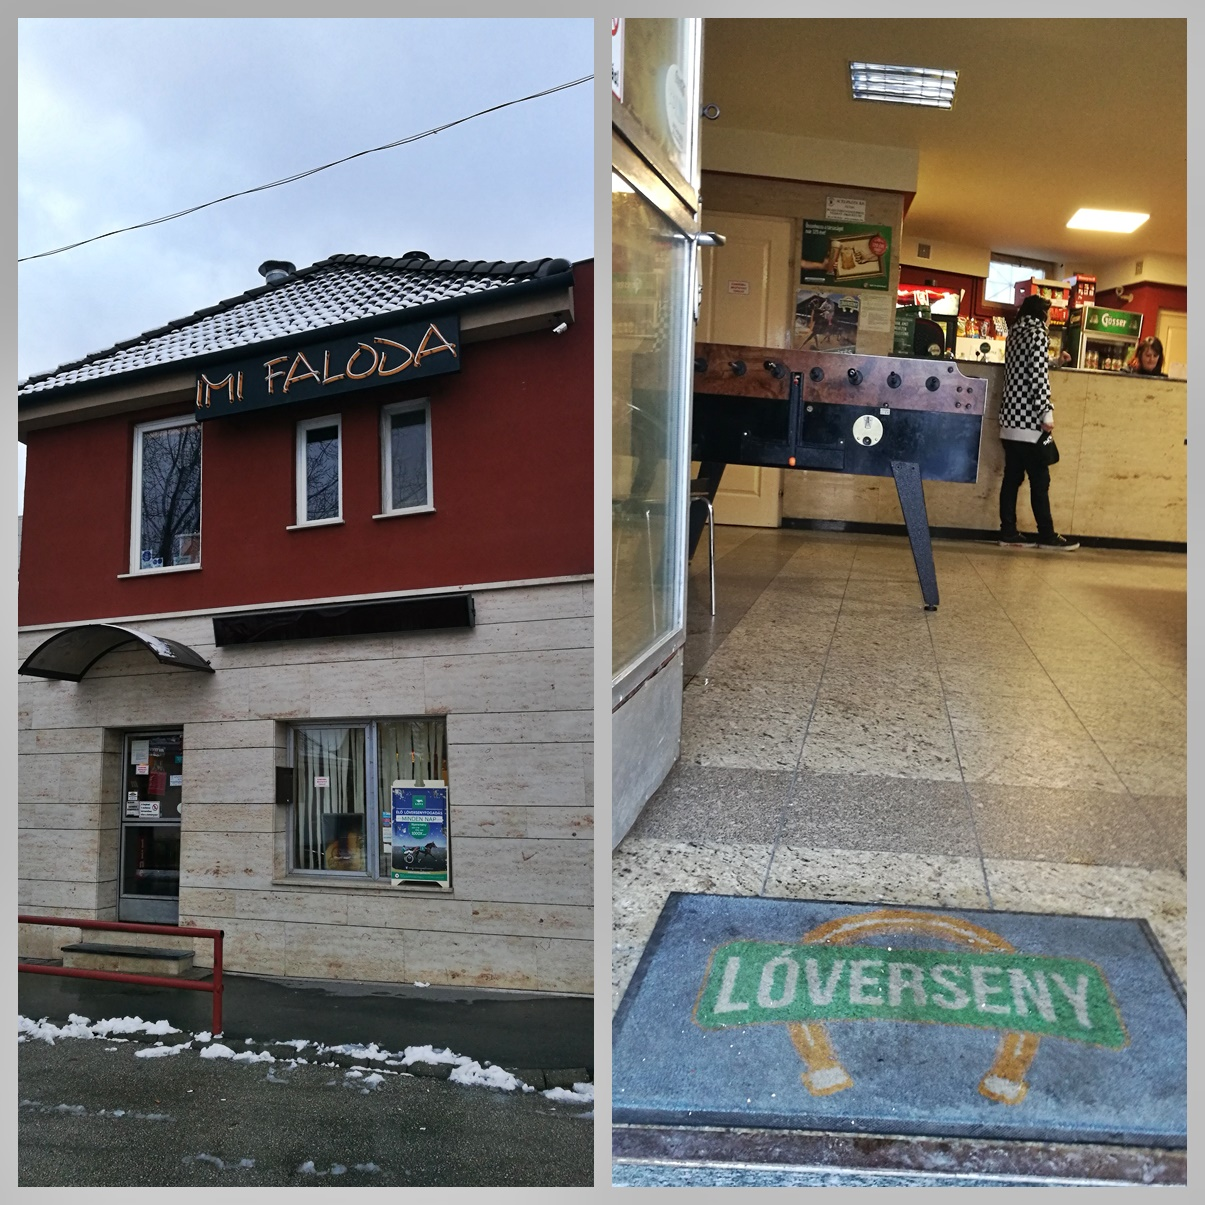 Budaörs kocsmái - Imi Faloda kívül-belül - Kocsmaturista